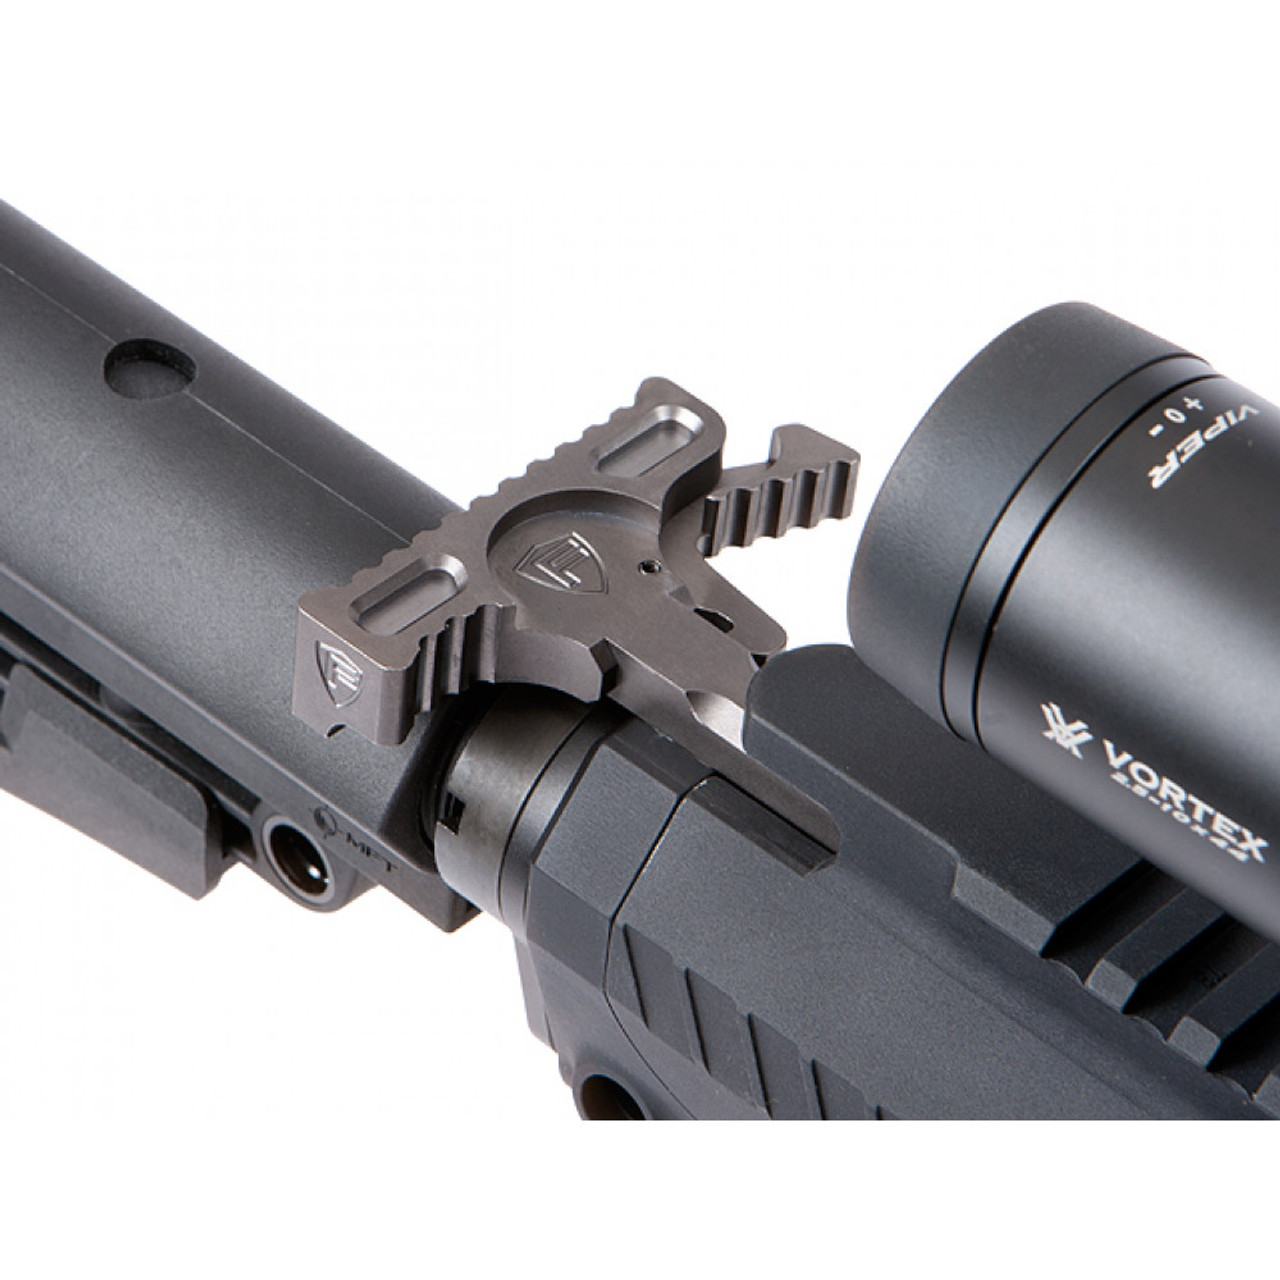 Fortis Hammer AR10 Charging Handle - 7.62/.308 - Black Teflon